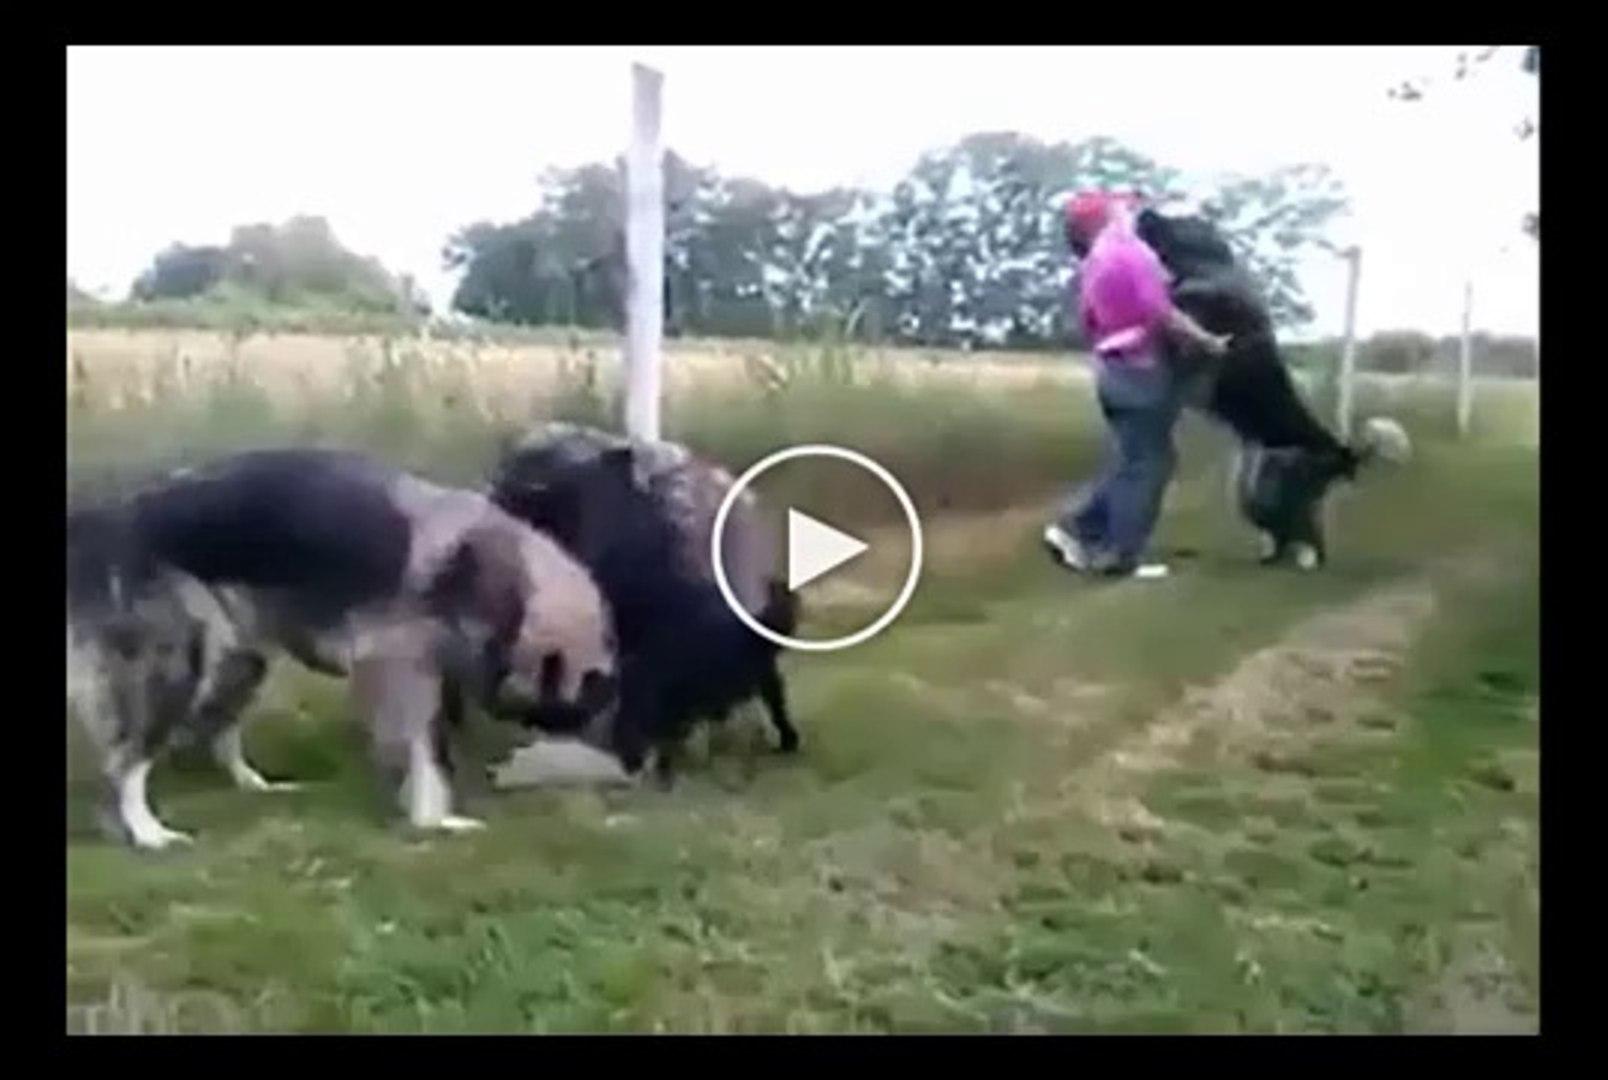 SUS KOPEKLERi vs KAFKAS COBAN KOPEKLERi - FANCY DOG vs CAUCASiAN SHEPHERD DOG